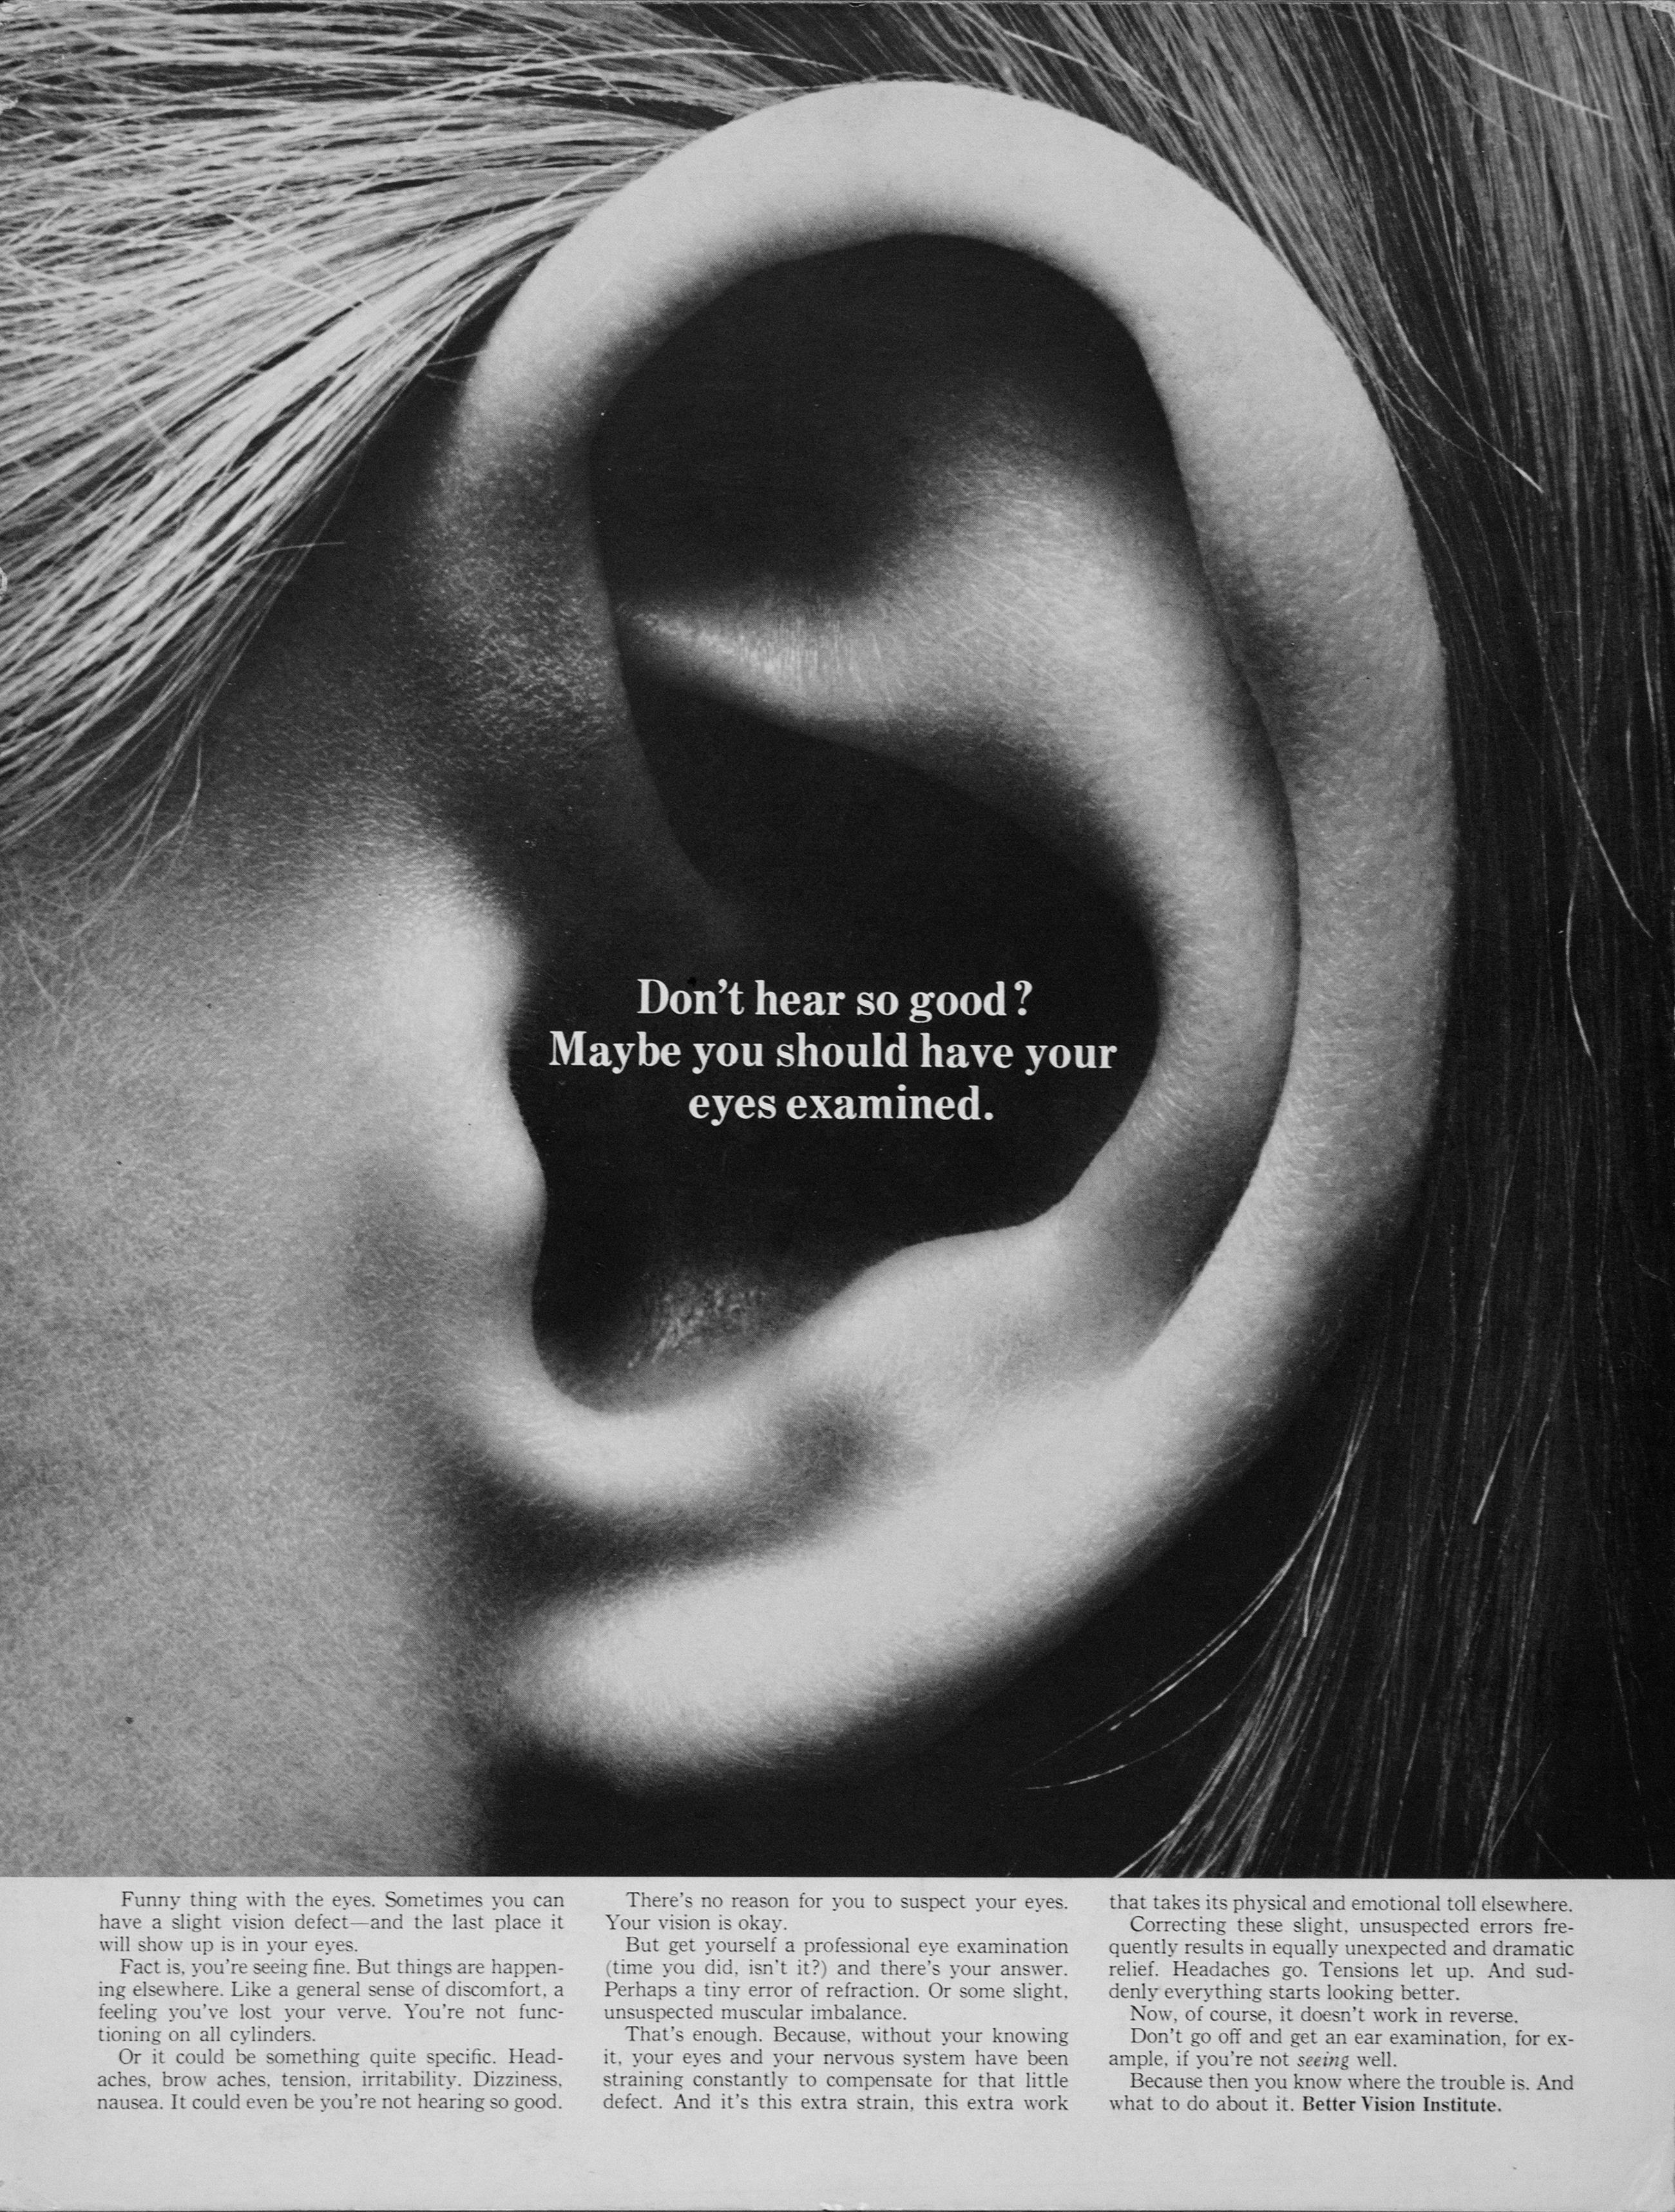 Better Vision Institute 'Ear' Len Sirowitz, DDB